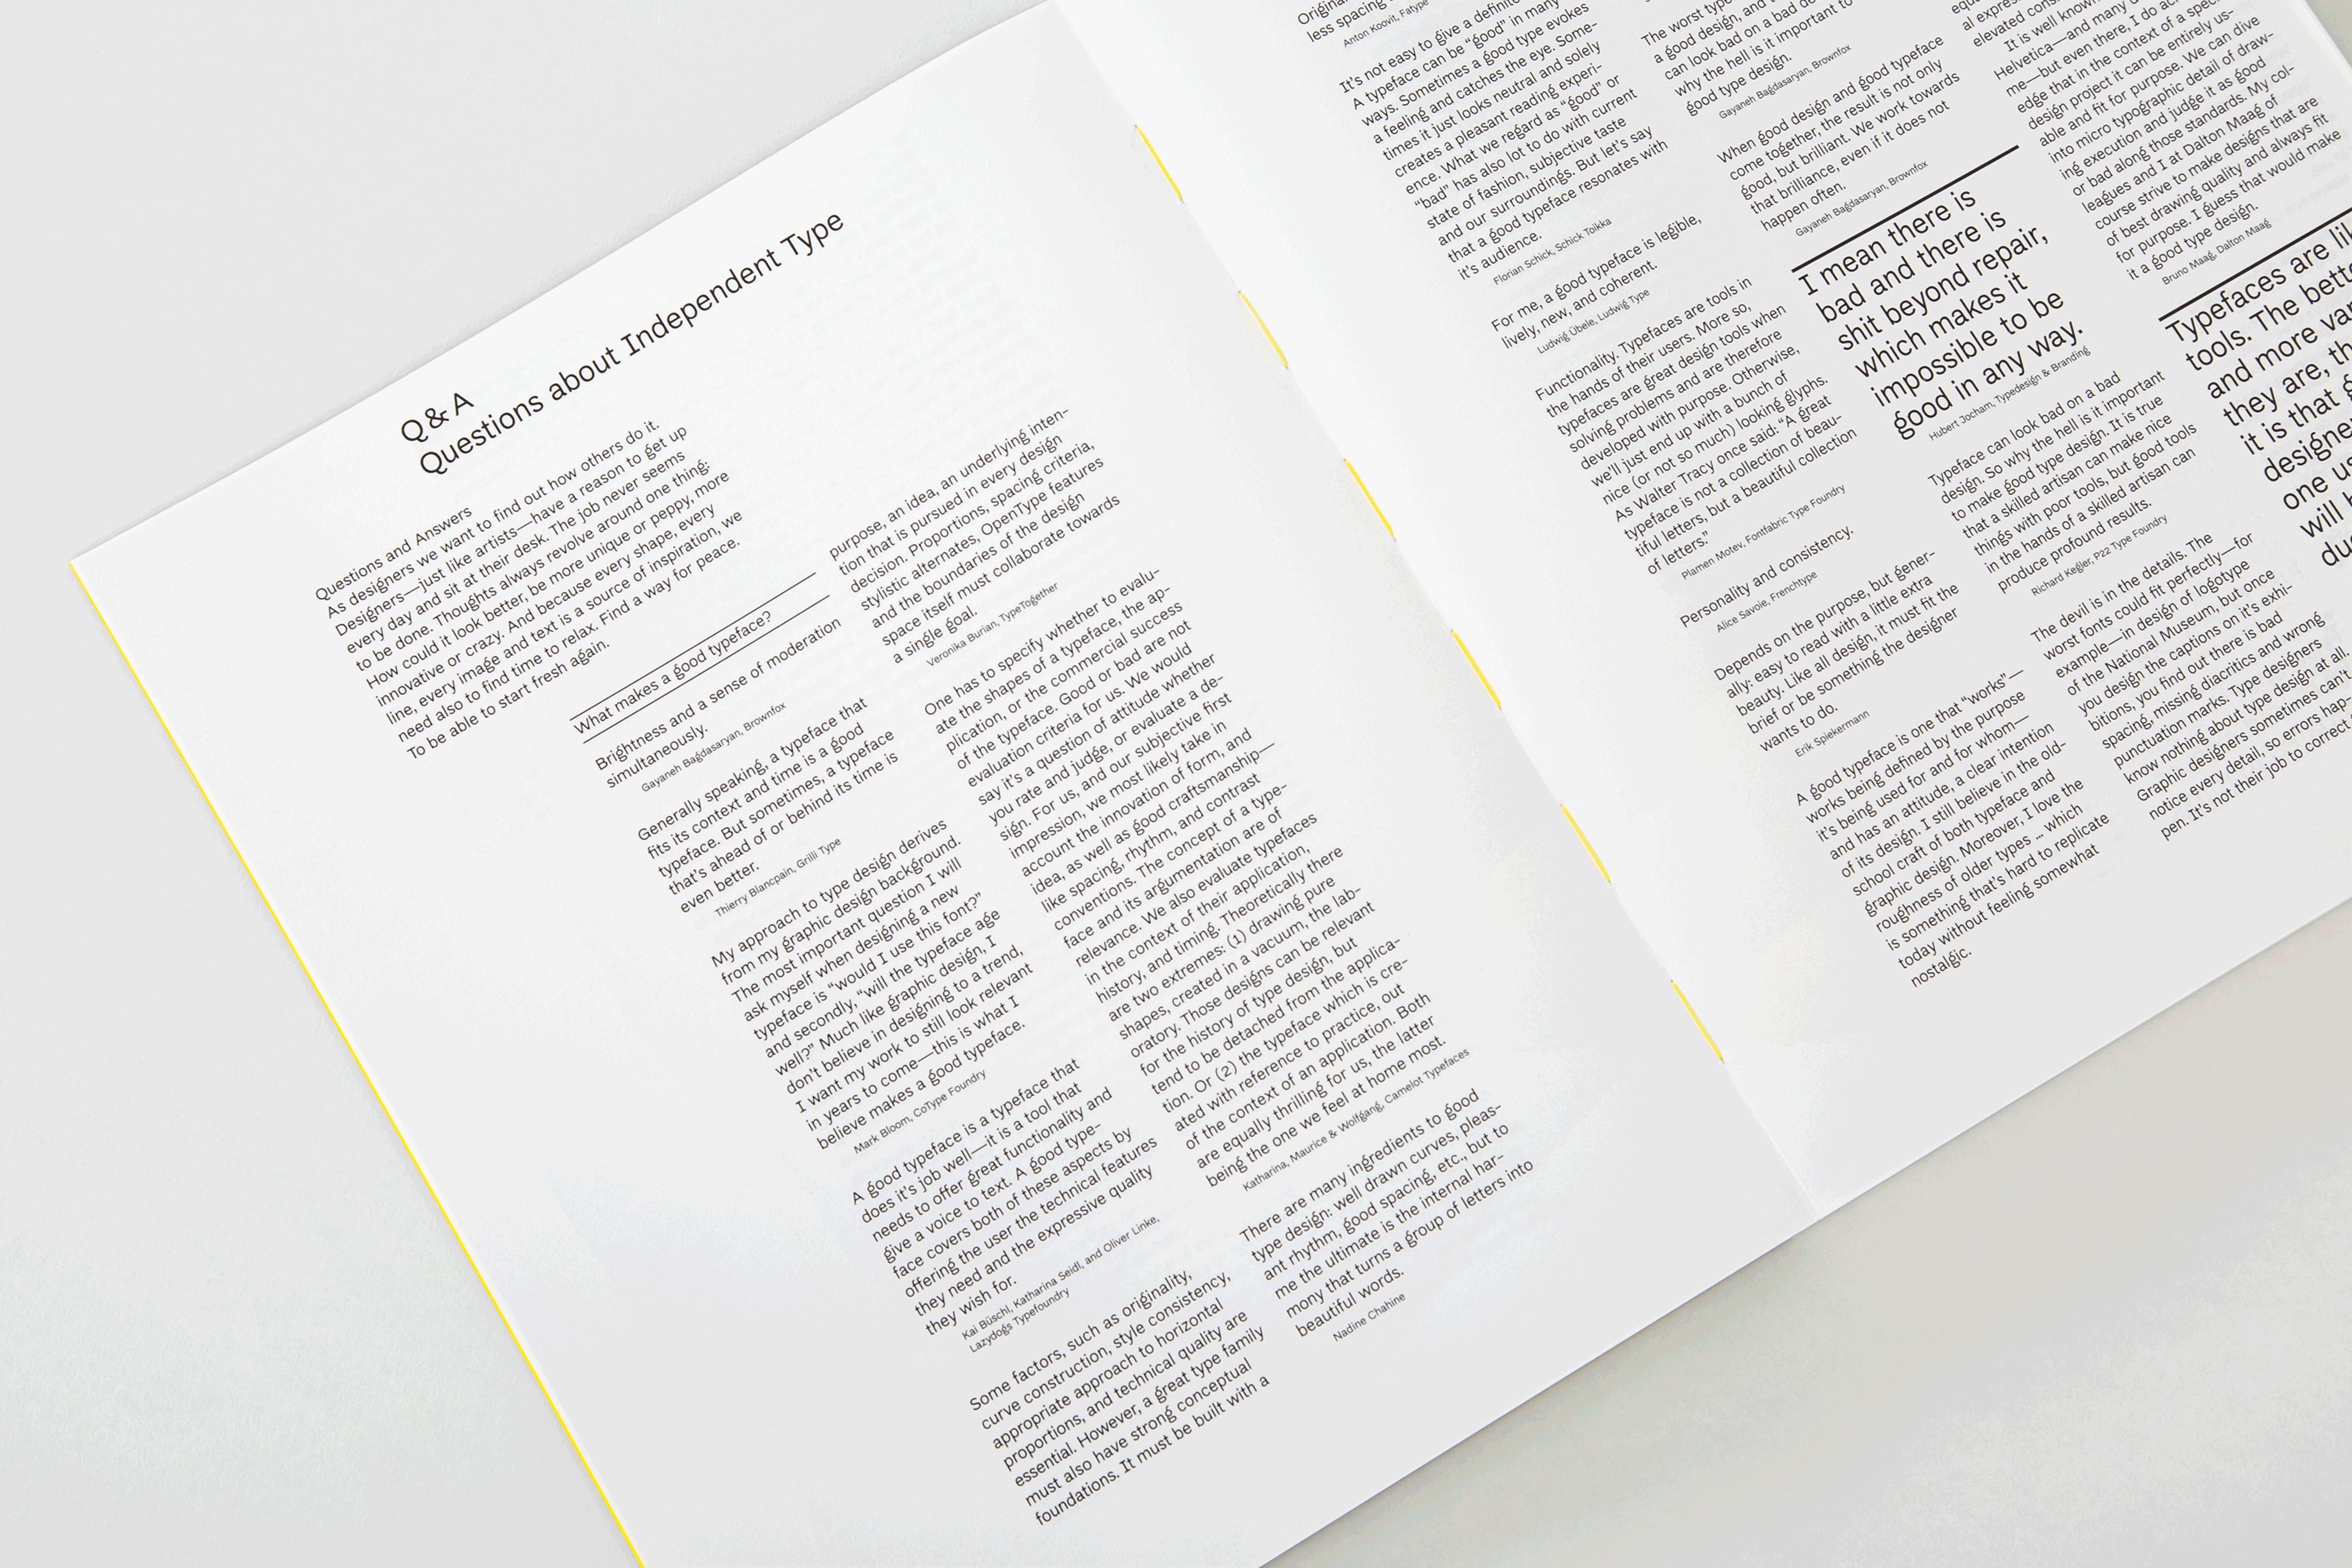 Slanted-Publiaktionen-Slanted-Publishers-Support-Independent-Type_09